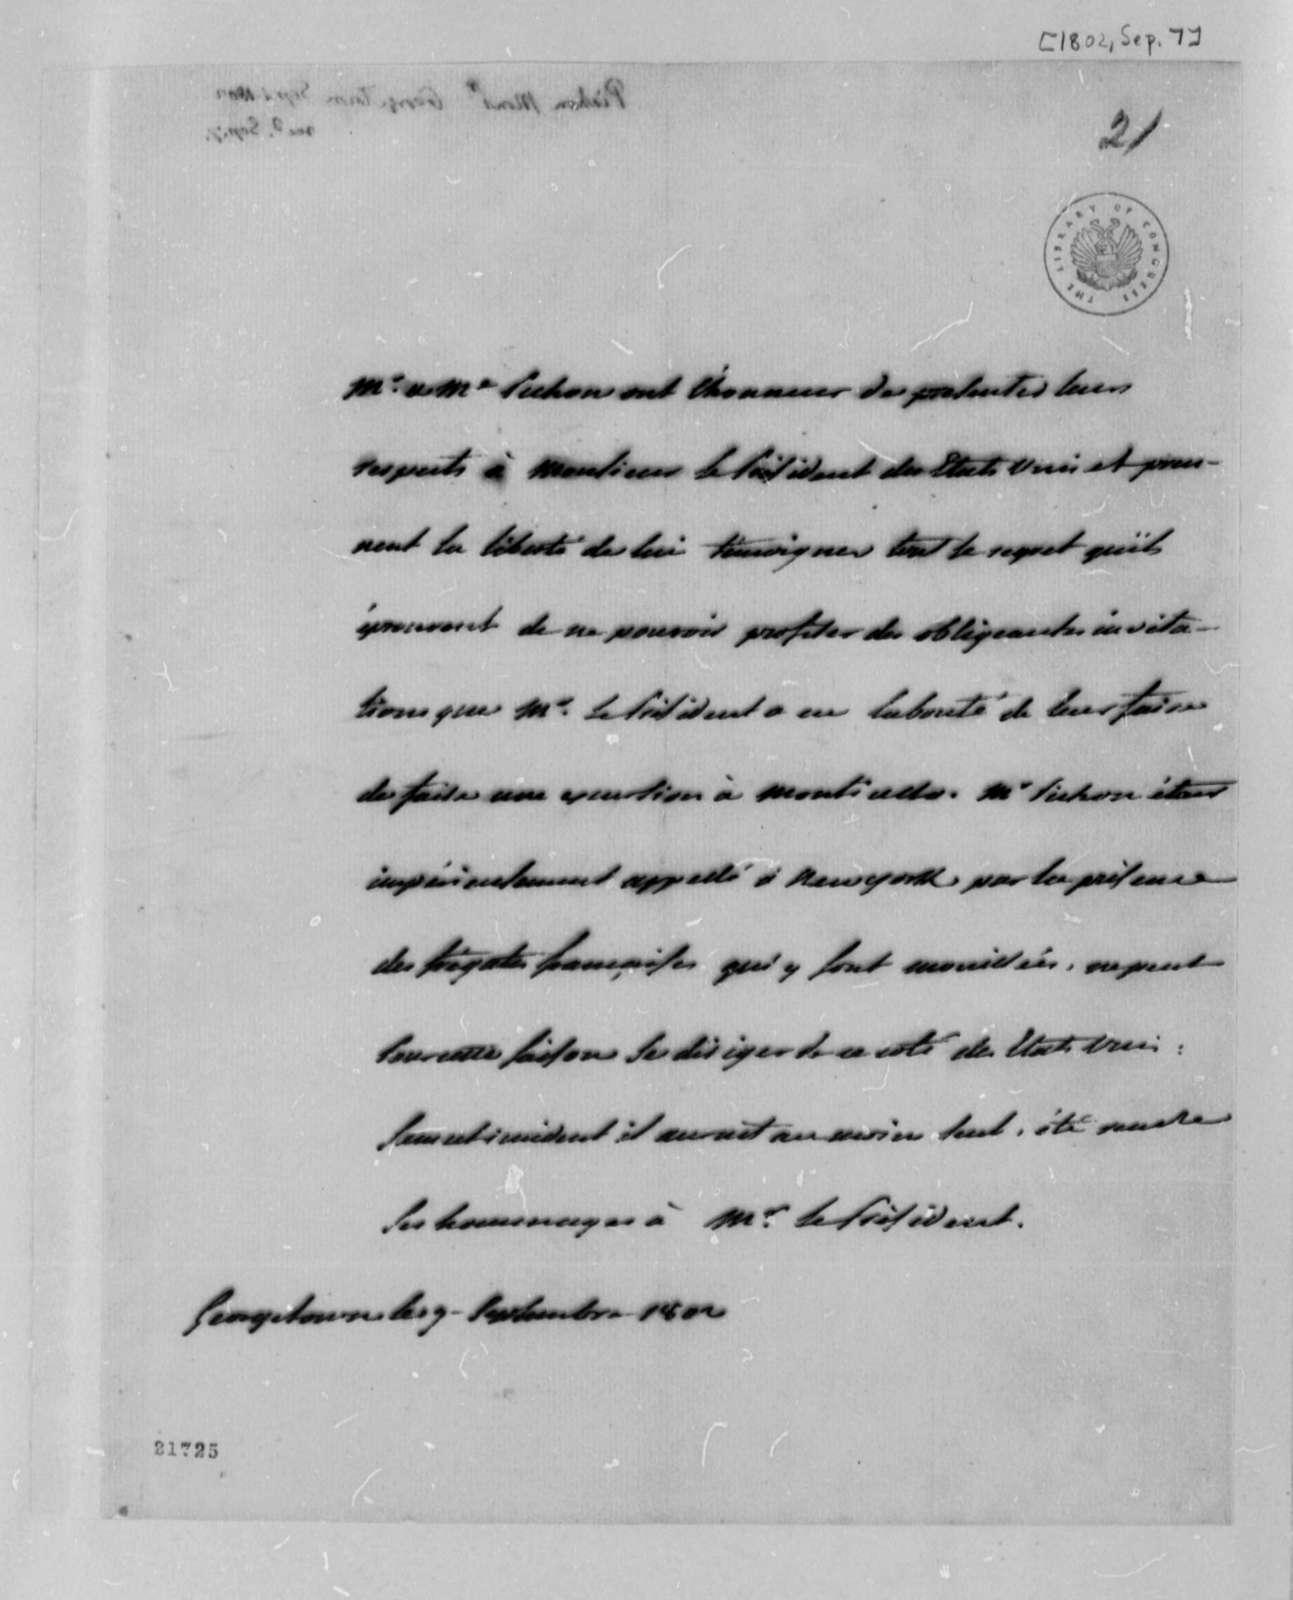 Louis A. Pichon to Thomas Jefferson, September 9, 1802